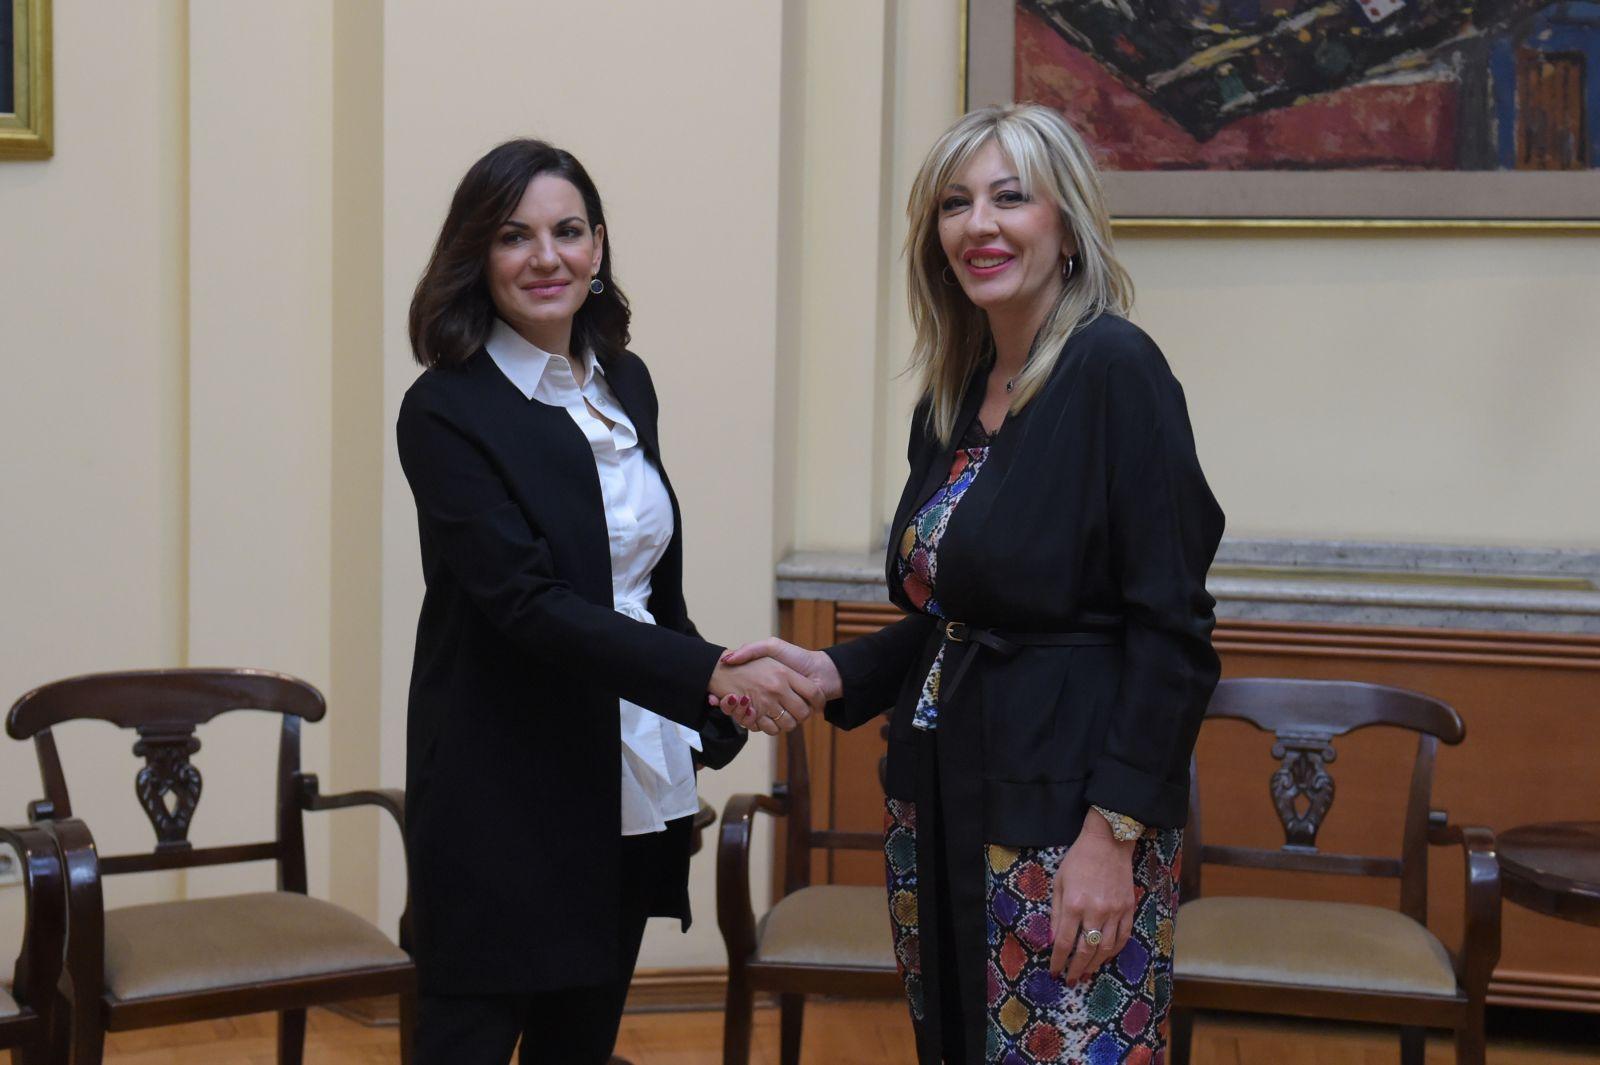 J. Joksimović and Kefalogianni: Friendship and strategic partnership between Serbia and Greece